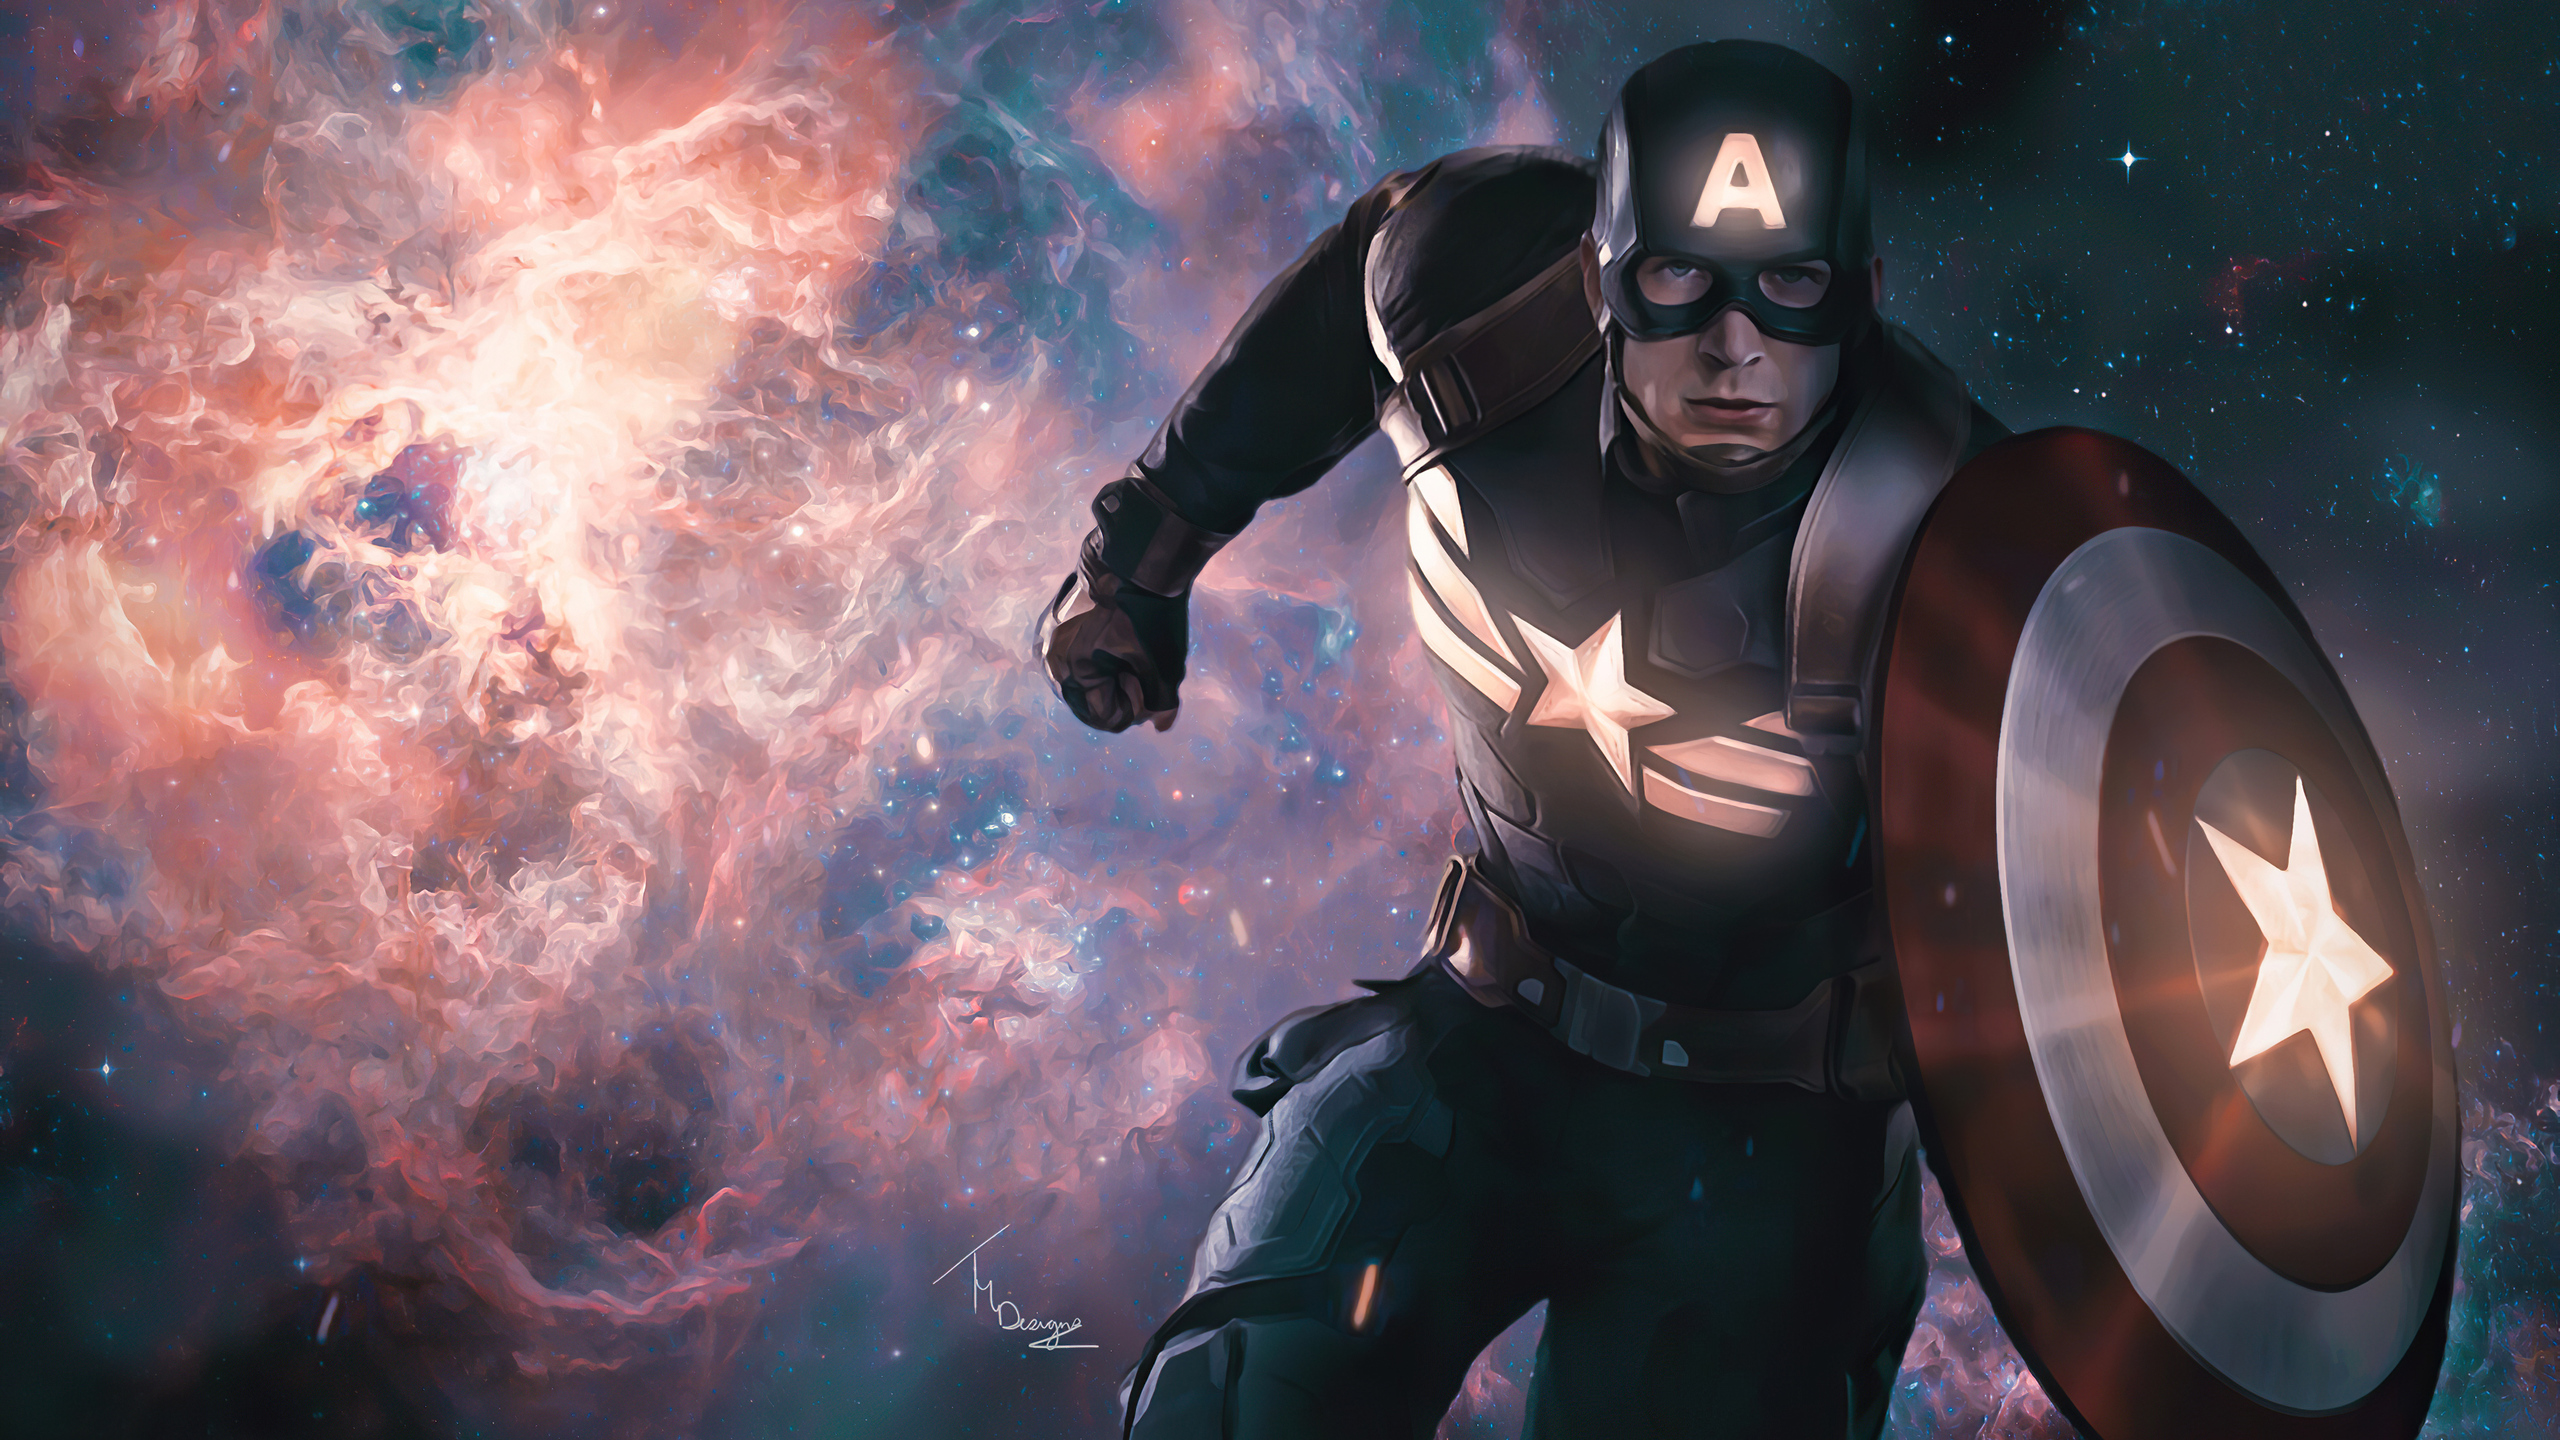 2560x1440 2020 Captain America 4k Artwork 1440P Resolution ...